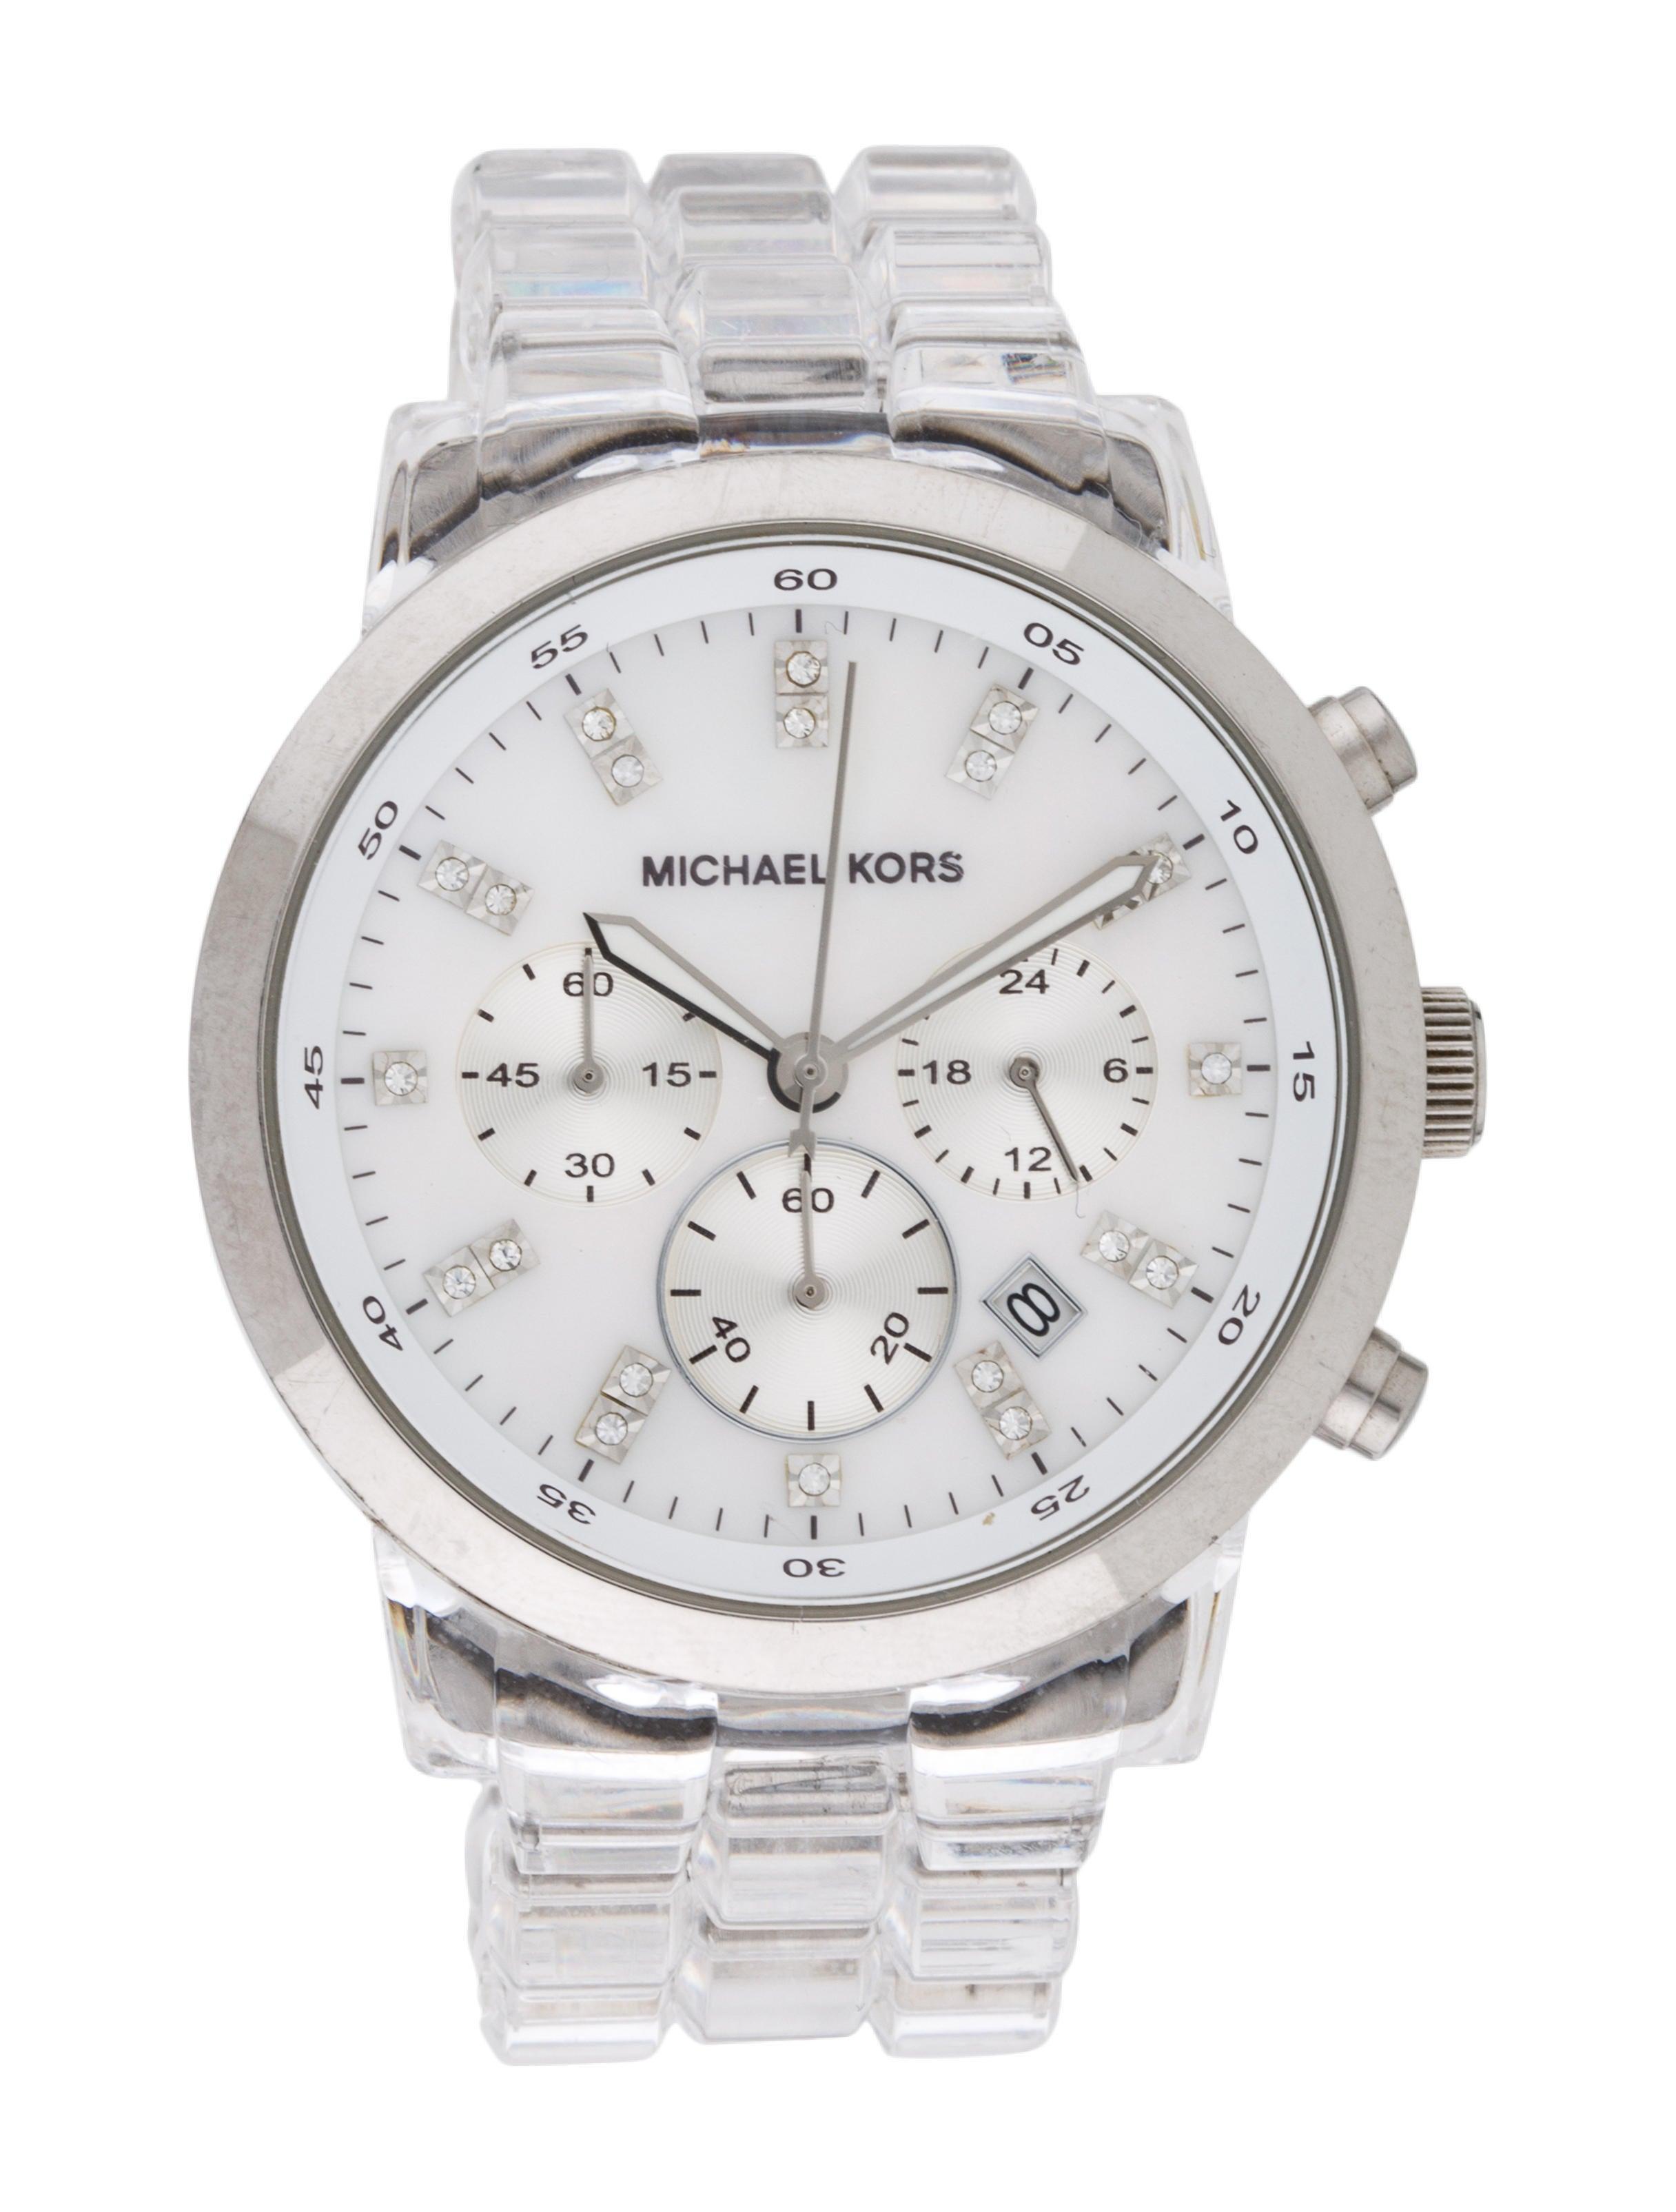 Michael Kors Cooper Watch Bracelet MIC100838 | The RealReal